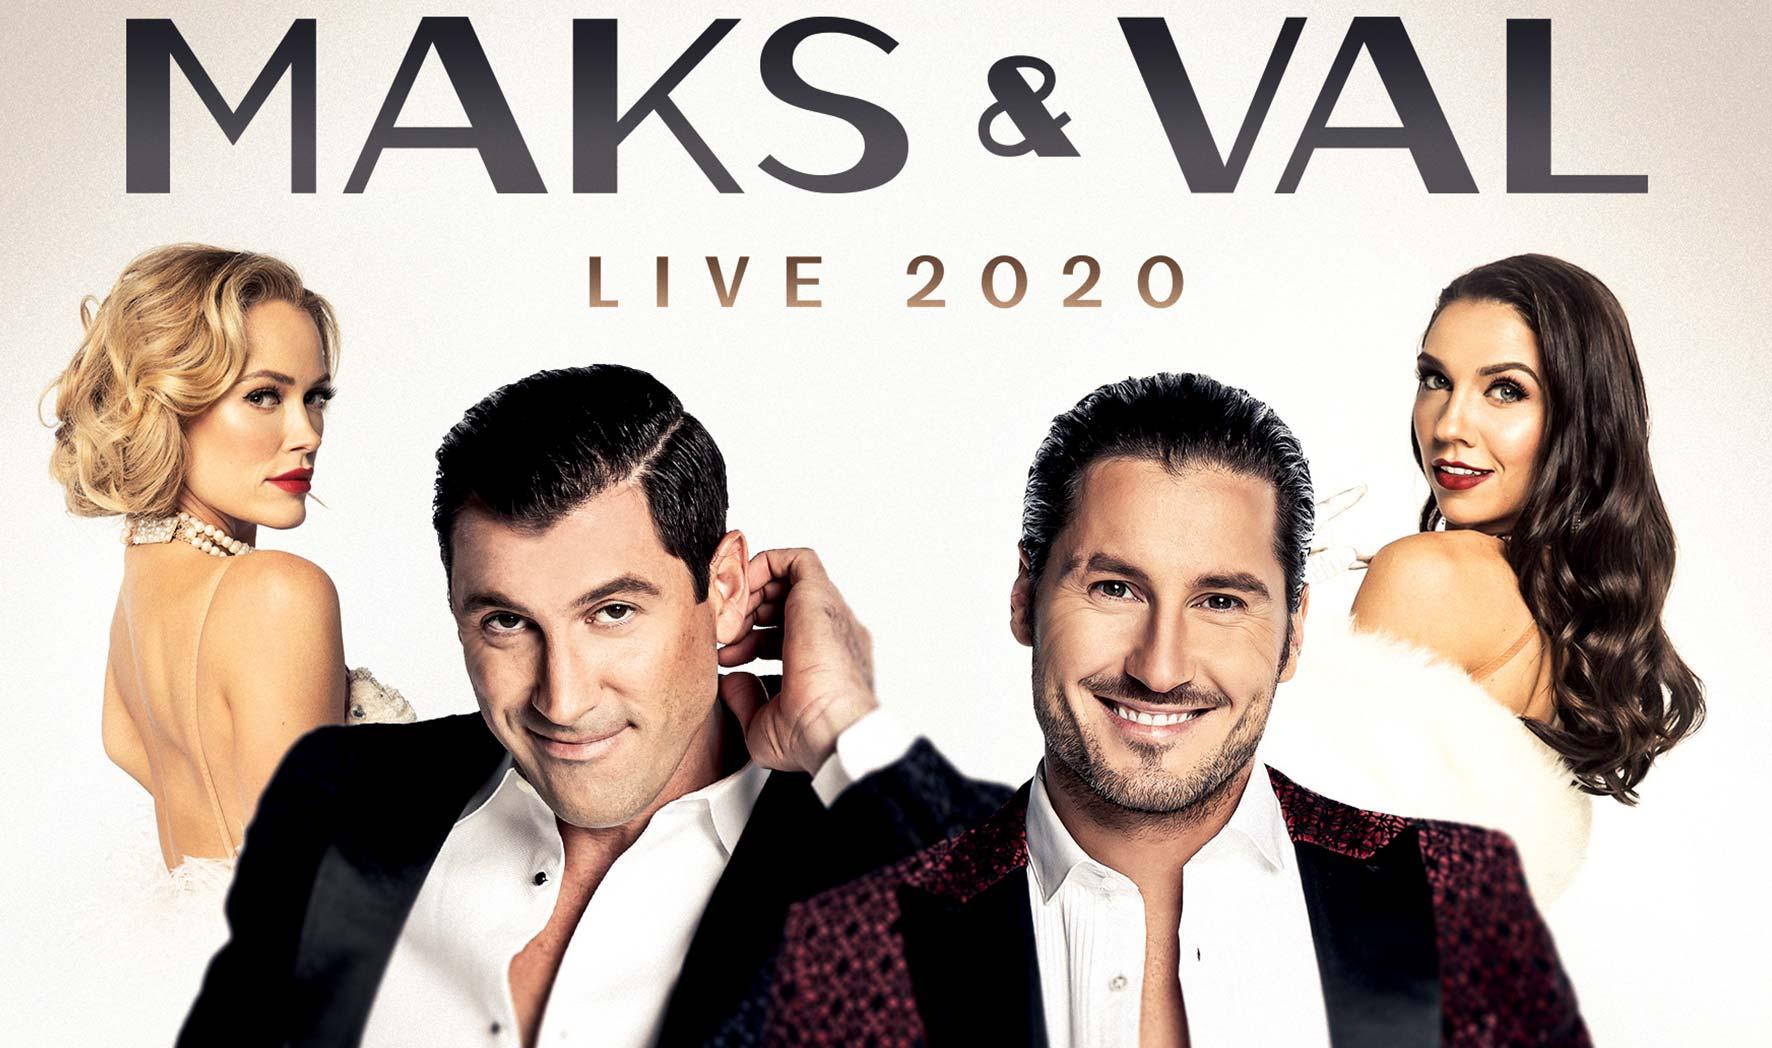 MAKS & VAL LIVE 2020 - Featuring Peta & Jenna